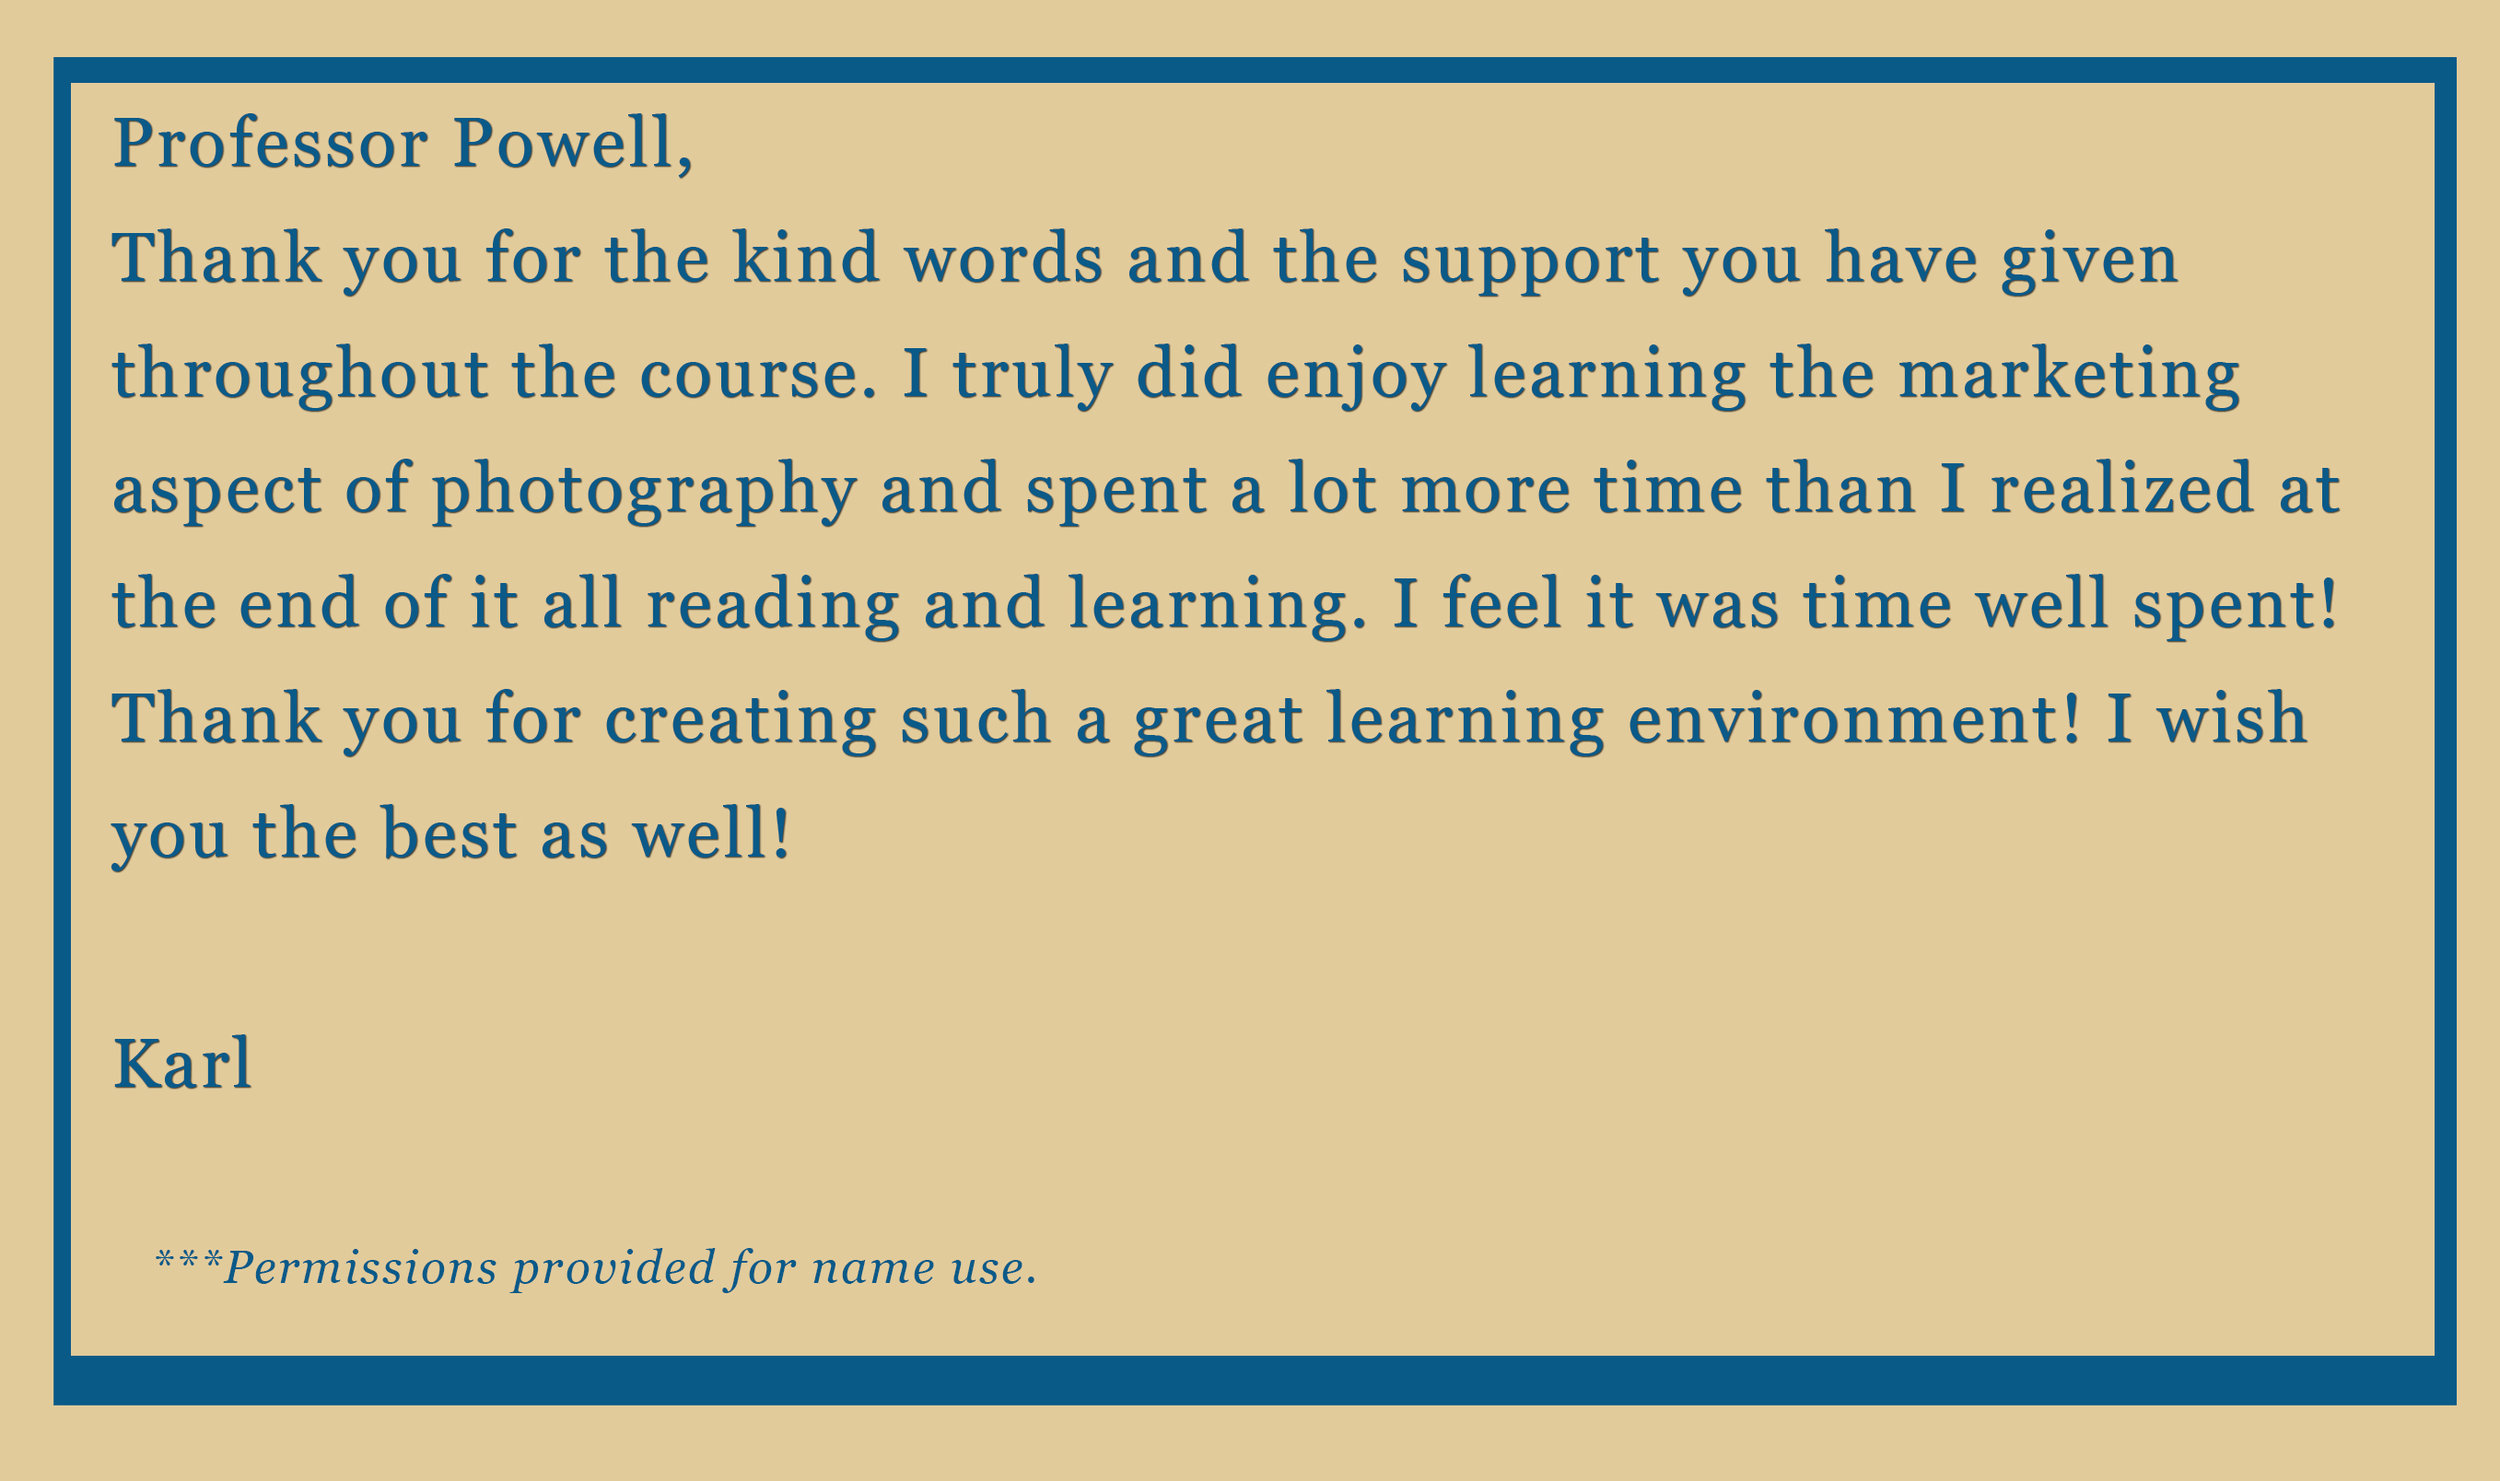 Powell review Karl.jpg